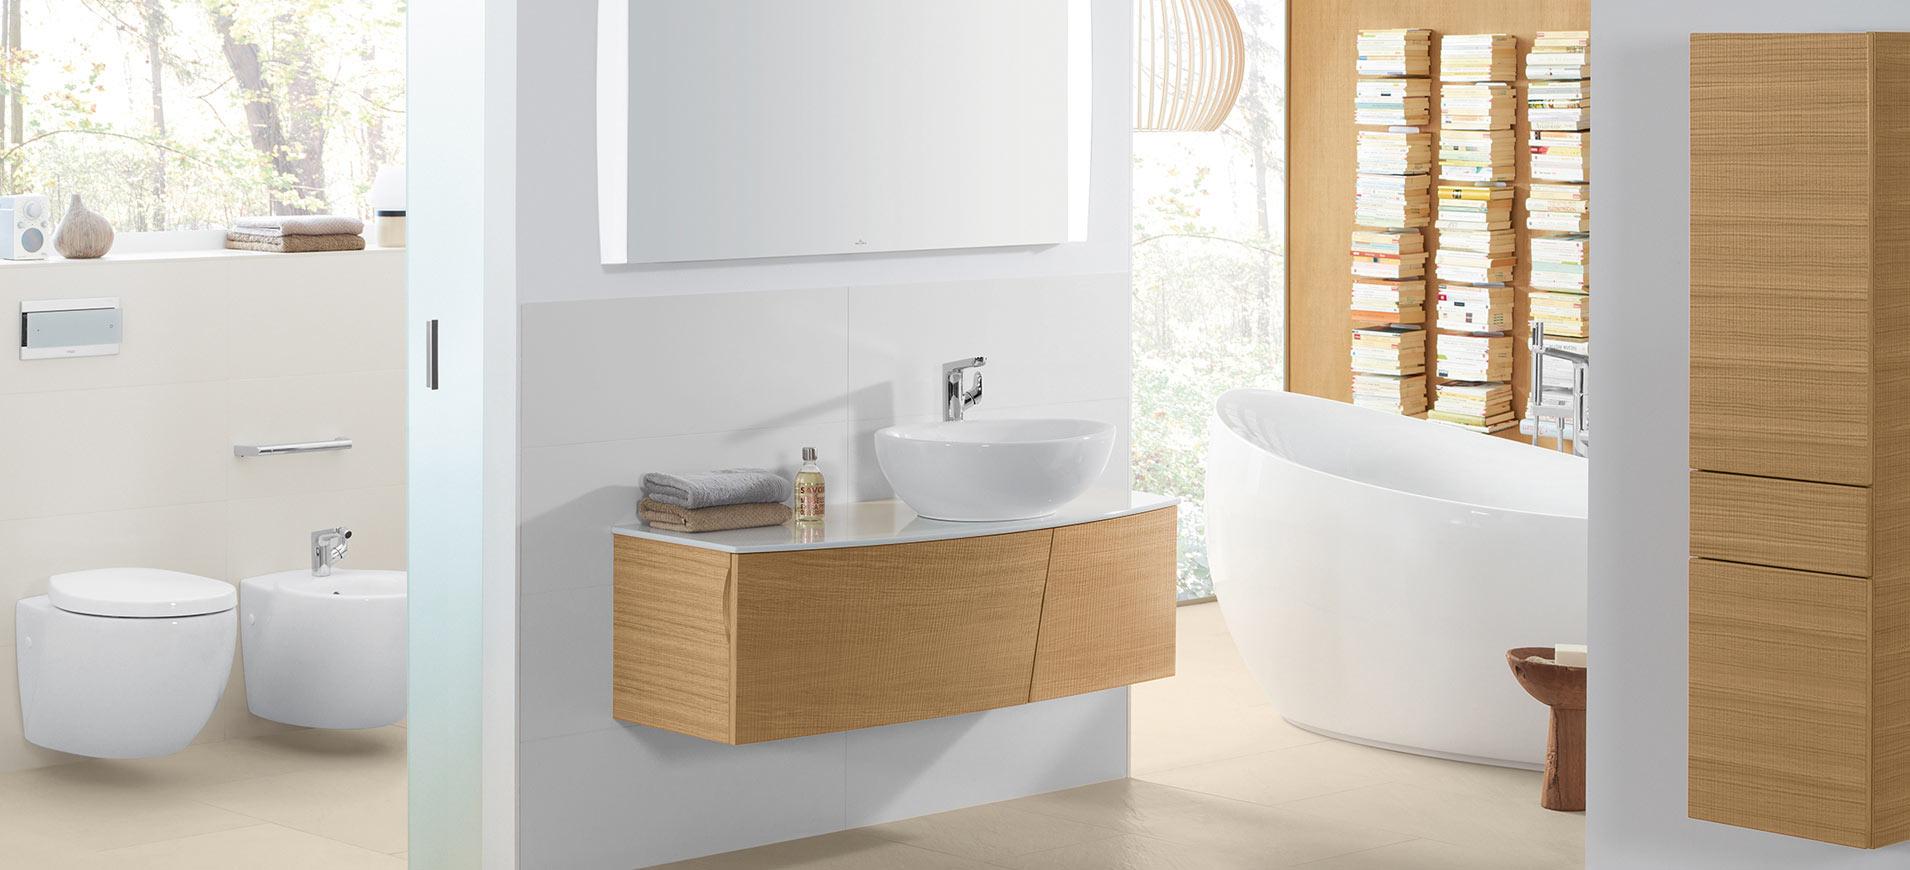 Aveo new generation for Bathroom planner villeroy